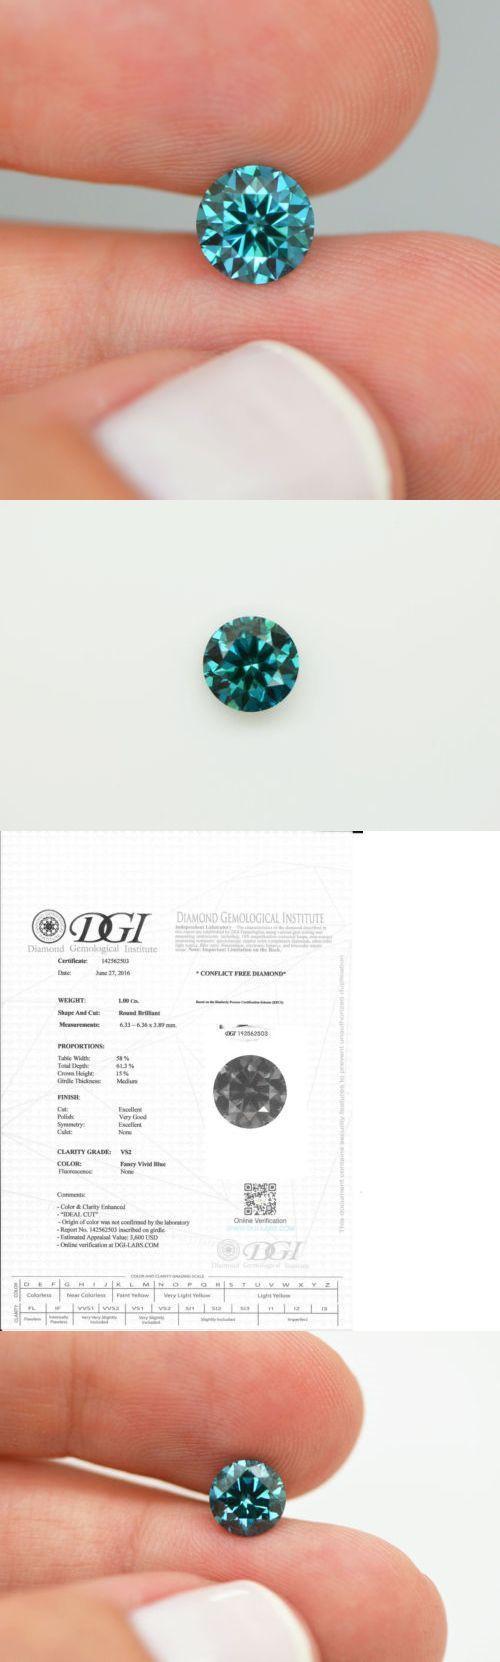 loose Diamonds : loose Diamonds : Enhanced Natural Diamonds 152810: One Carat Fancy Blue Round ...